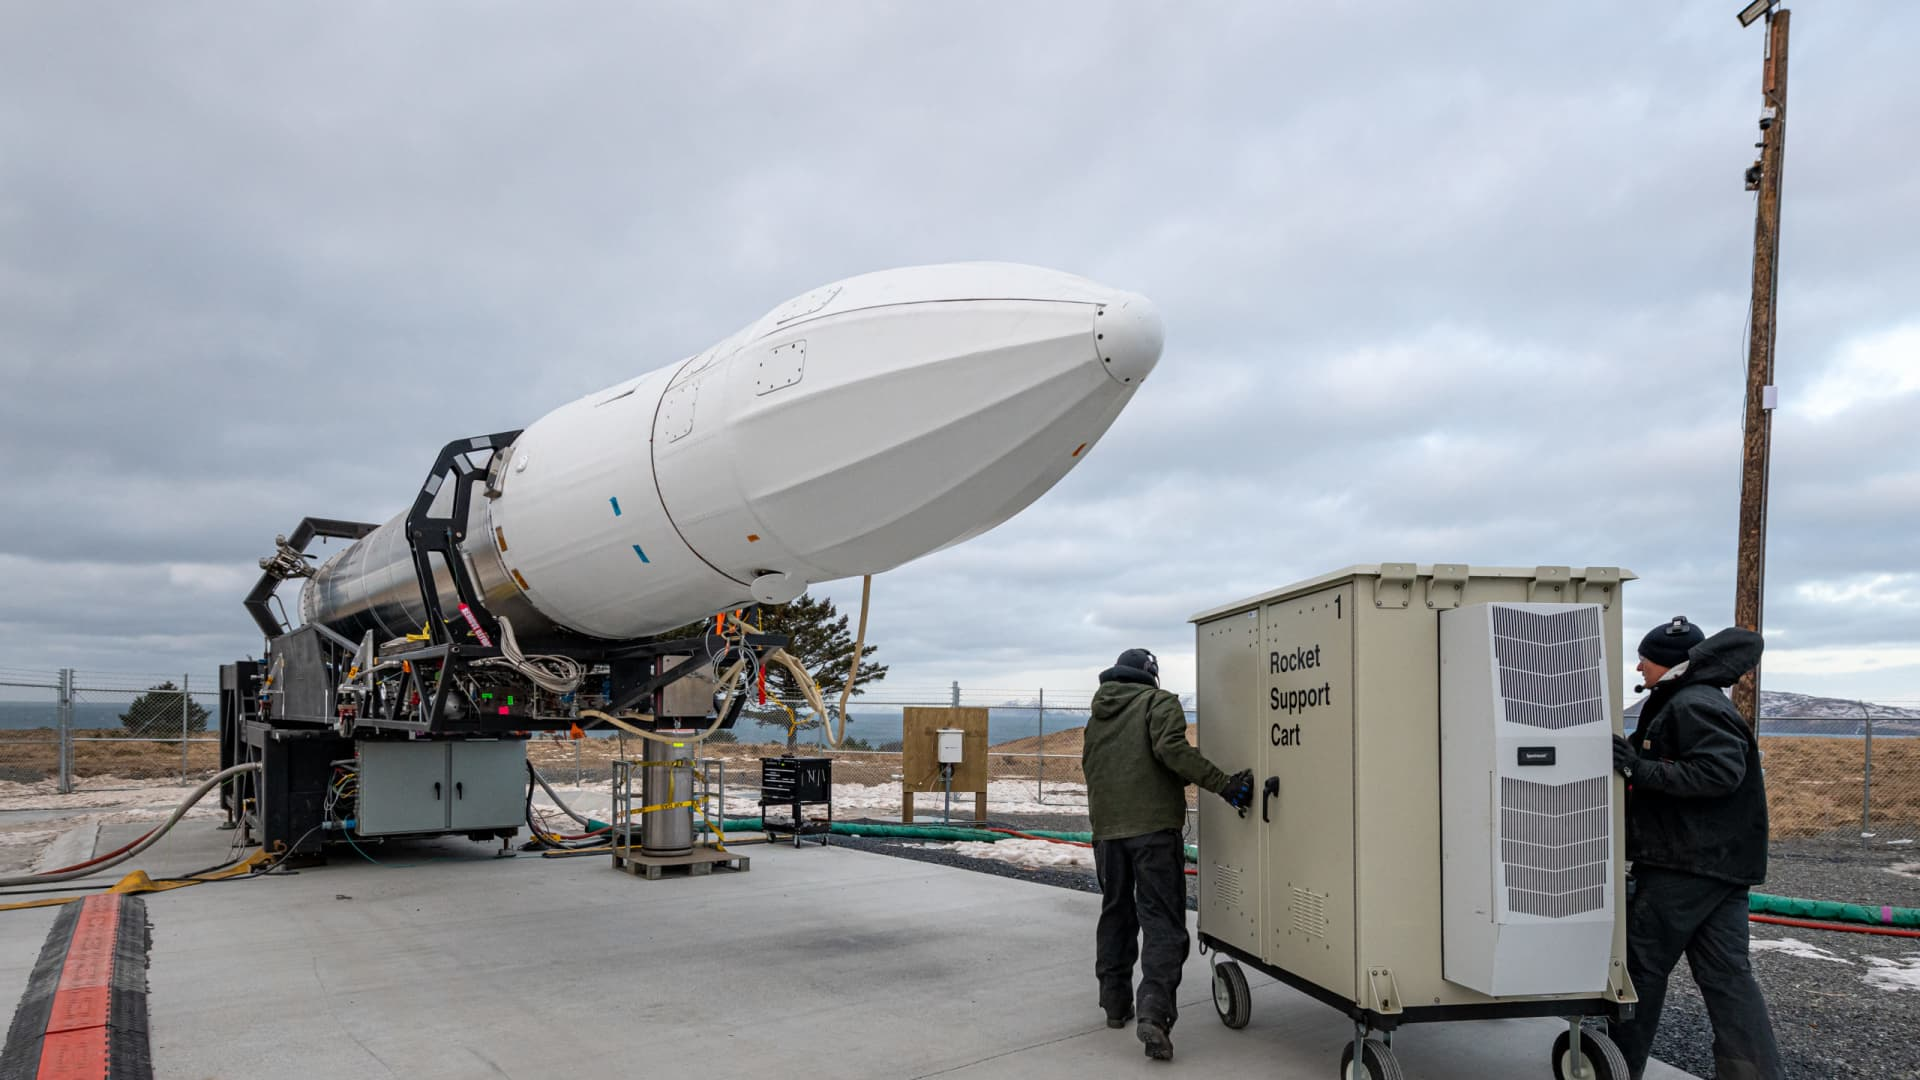 Astra's rocket 3.0 during launch preparations in Kodiak, Alaska.